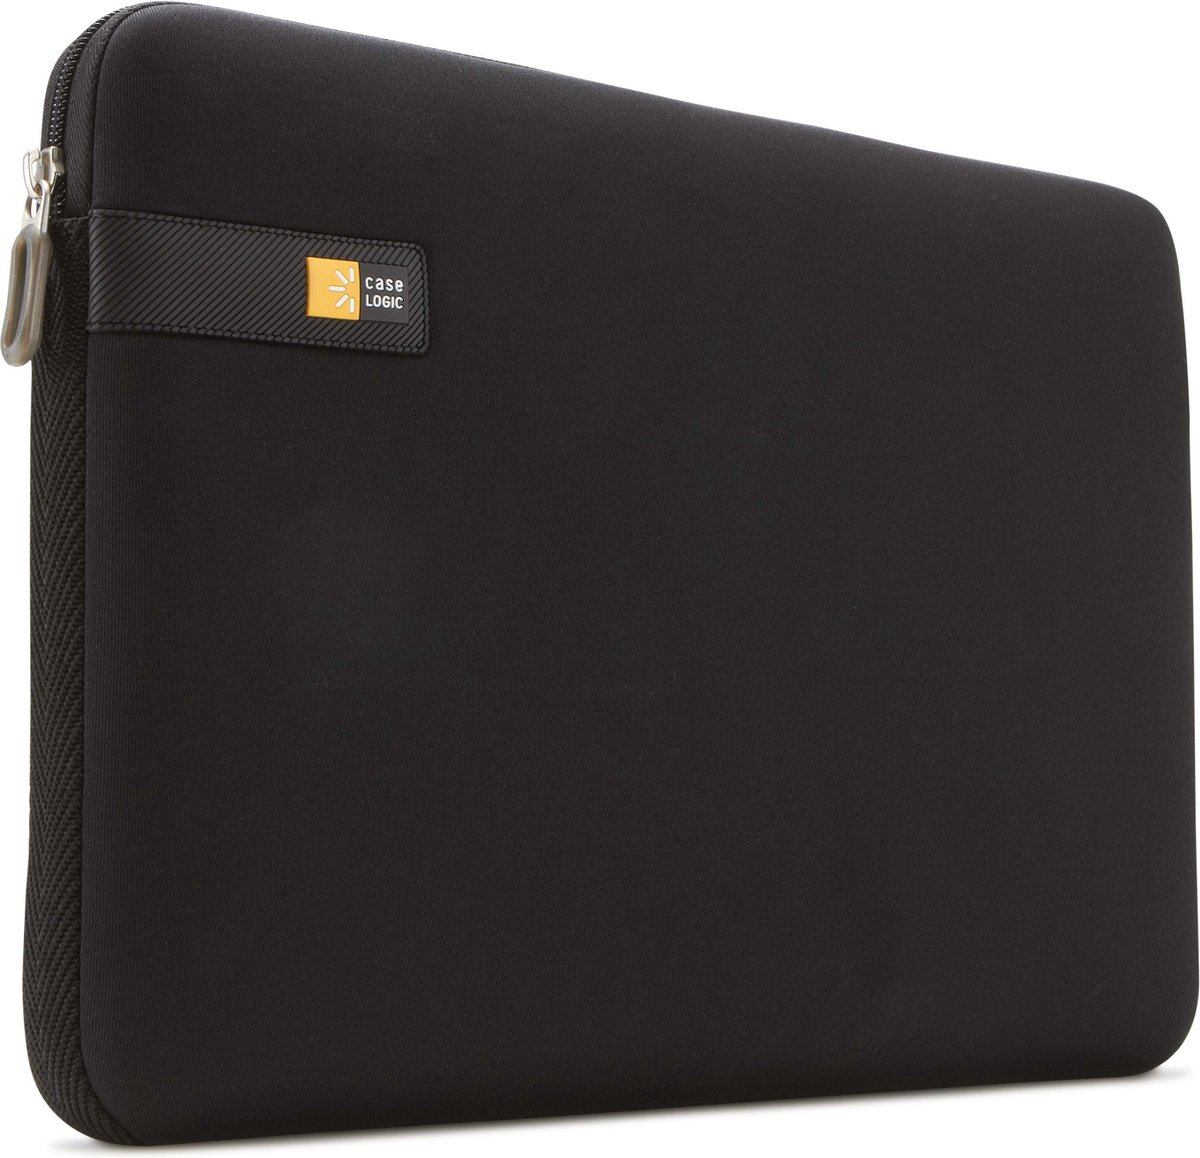 Case Logic LAPS111 - Laptop Sleeve - 11.6 inch / Zwart